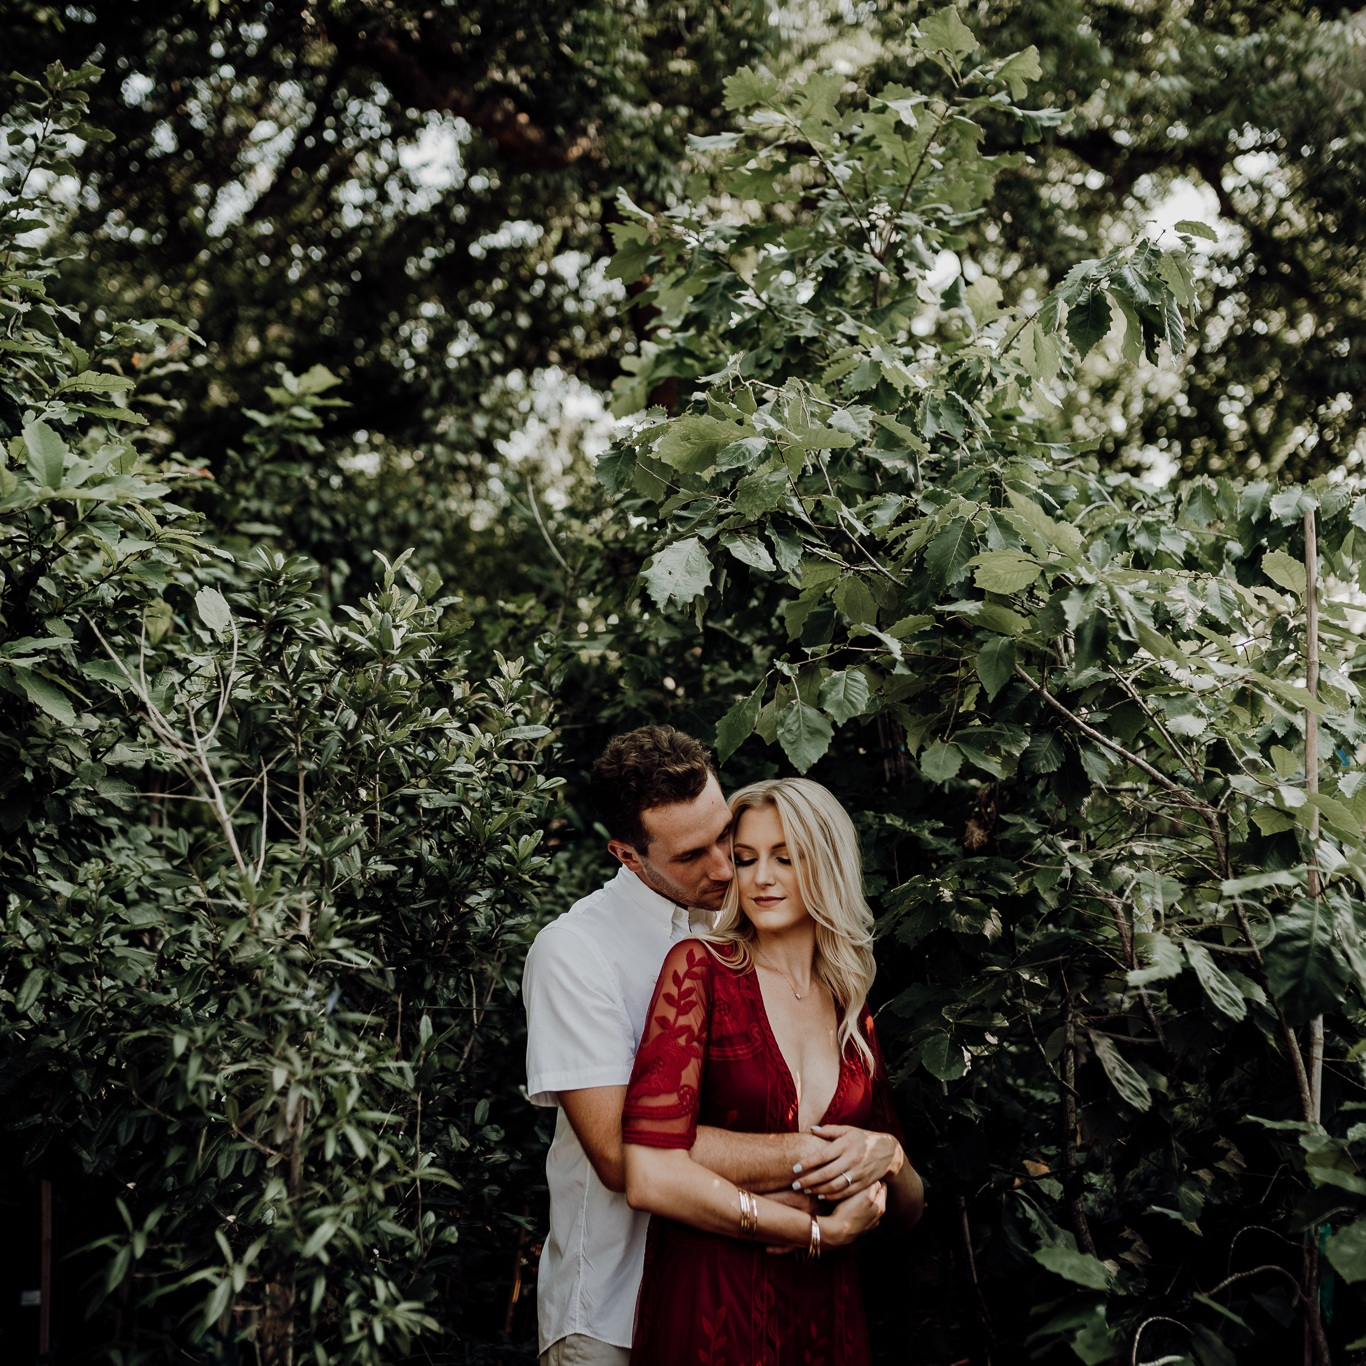 kristen+giles+photography+%7C+texas+wedding+photographer+-+austin+plant+shop+engagement+session-17-blog.jpg